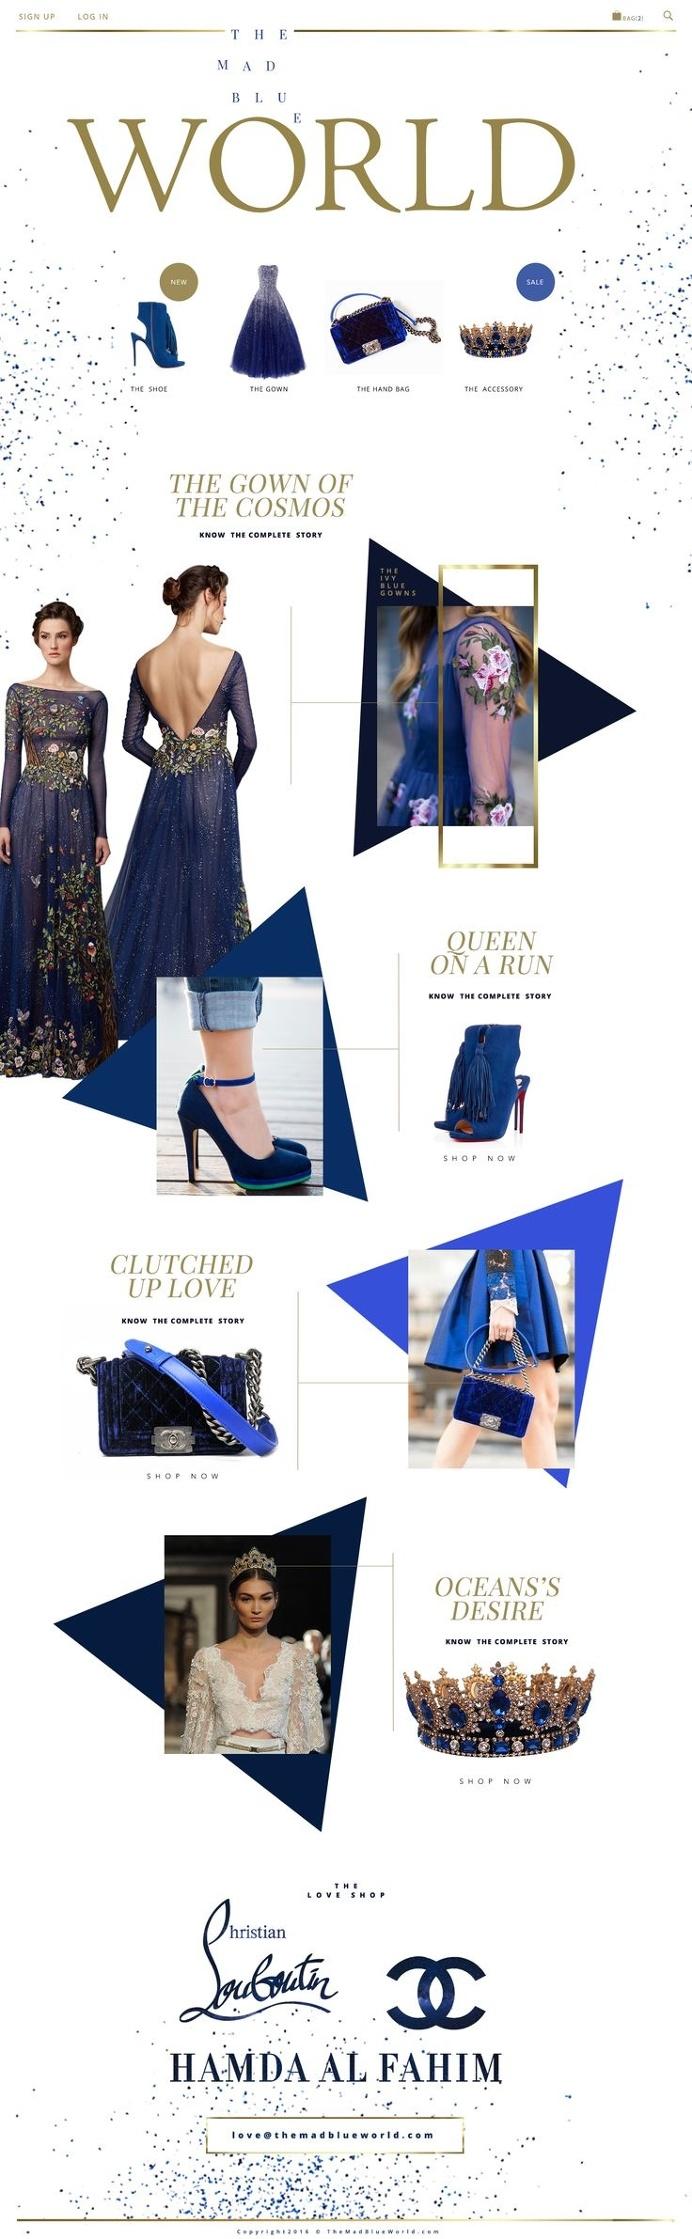 #design #layout #fashion #website #graphic #blue